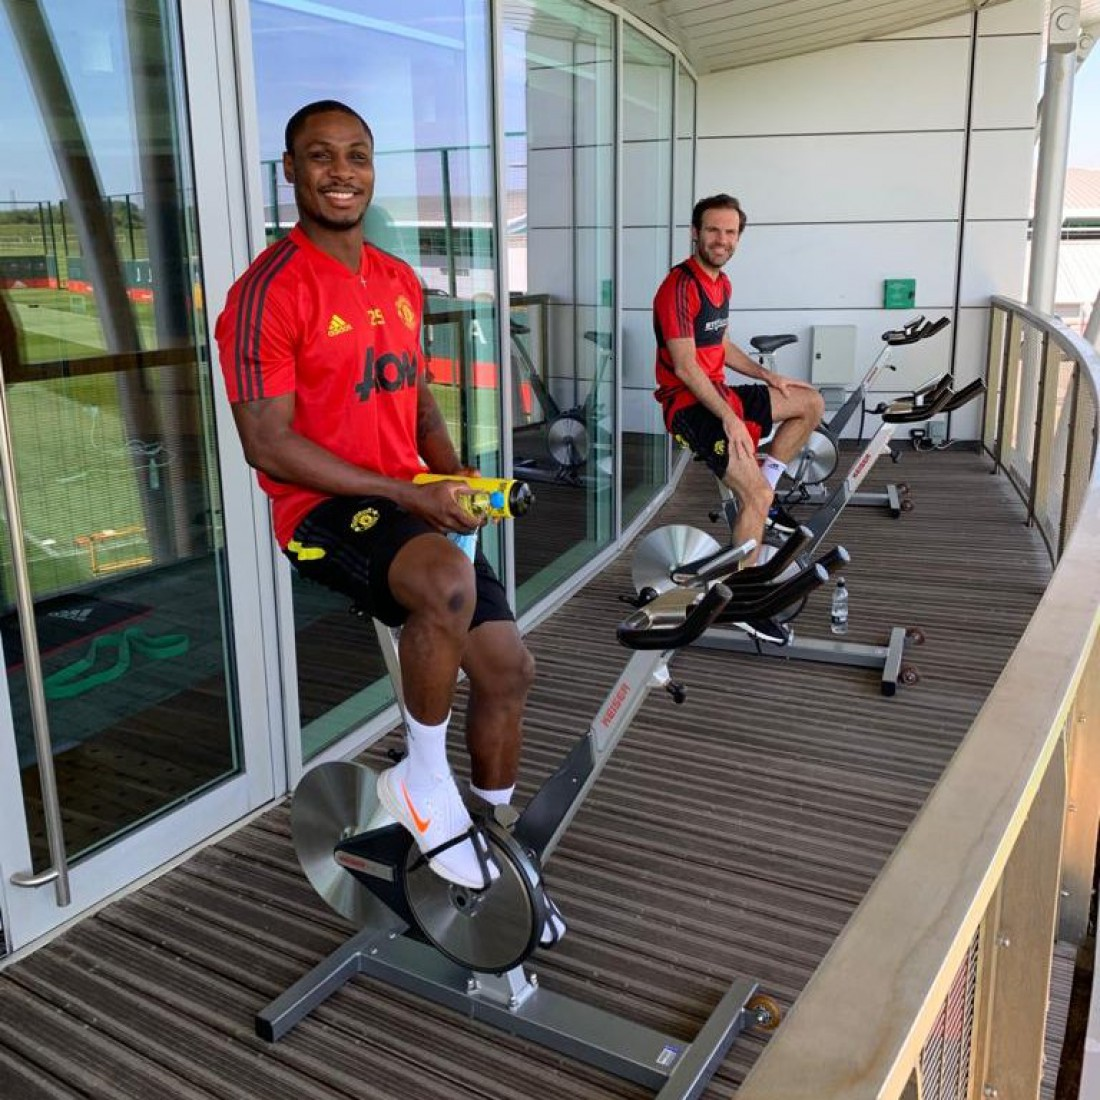 Манчестер Юнайтед возобновили тренировки